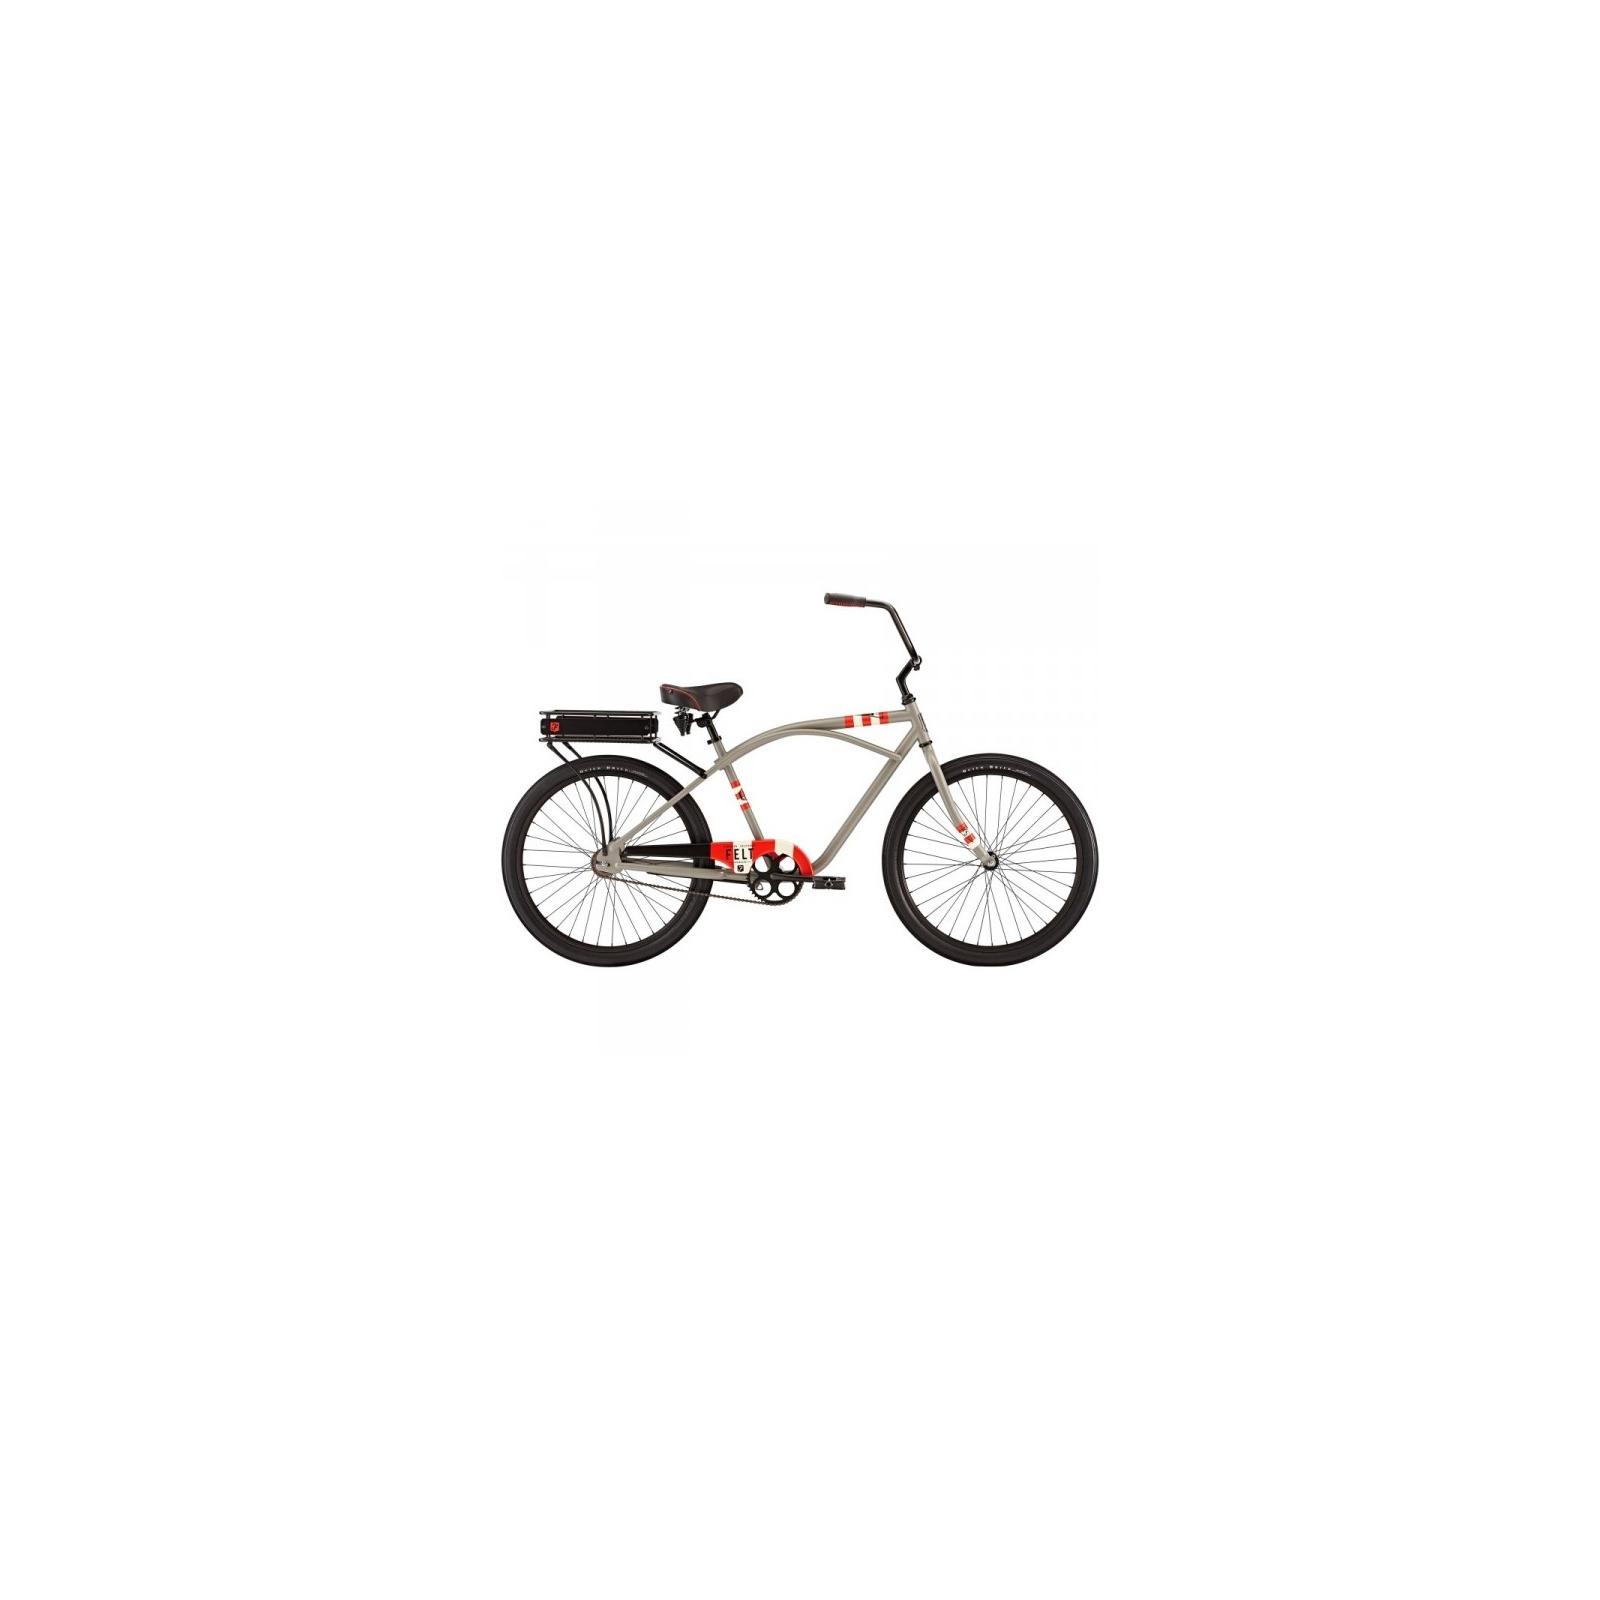 "Велосипед Felt Cruiser Jetty Mens 18"" olive (8058 78307)"